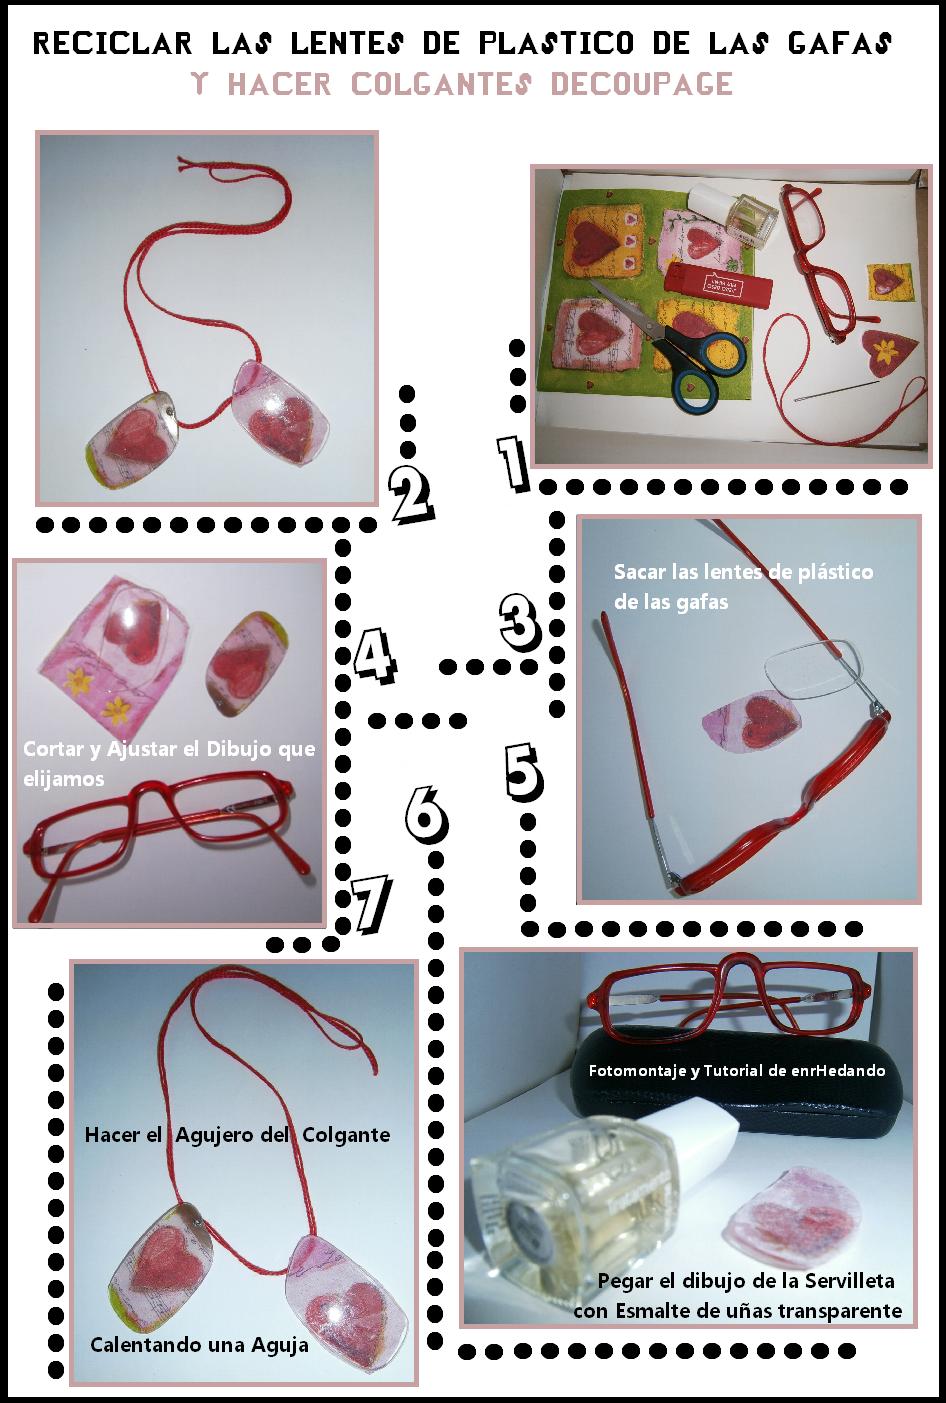 gafas, colgantes, bisutería, manualidades, transformar